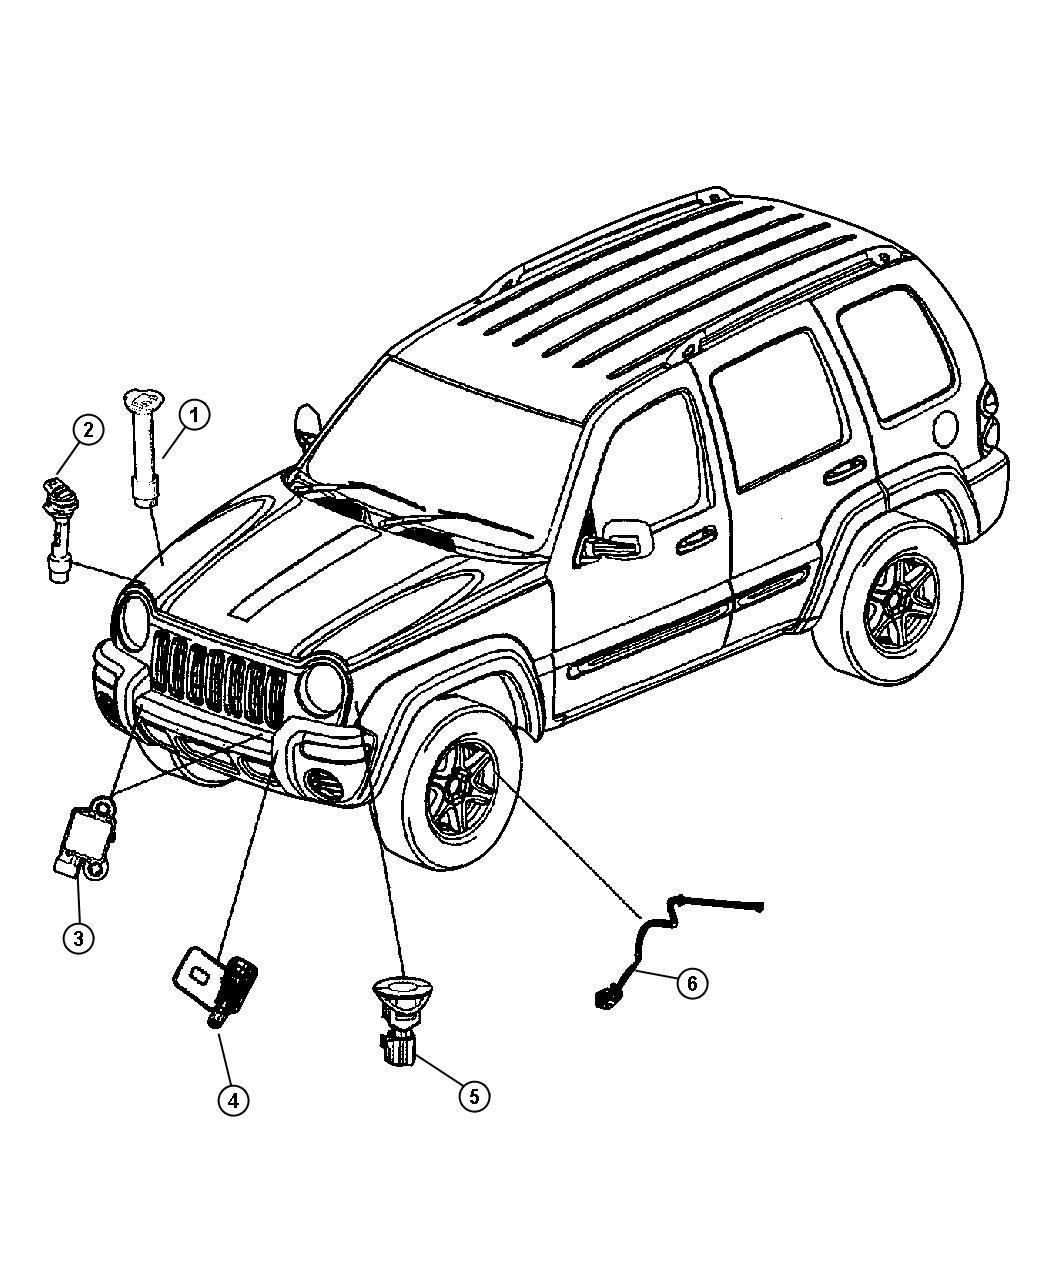 Jeep Liberty Fuse Box Location